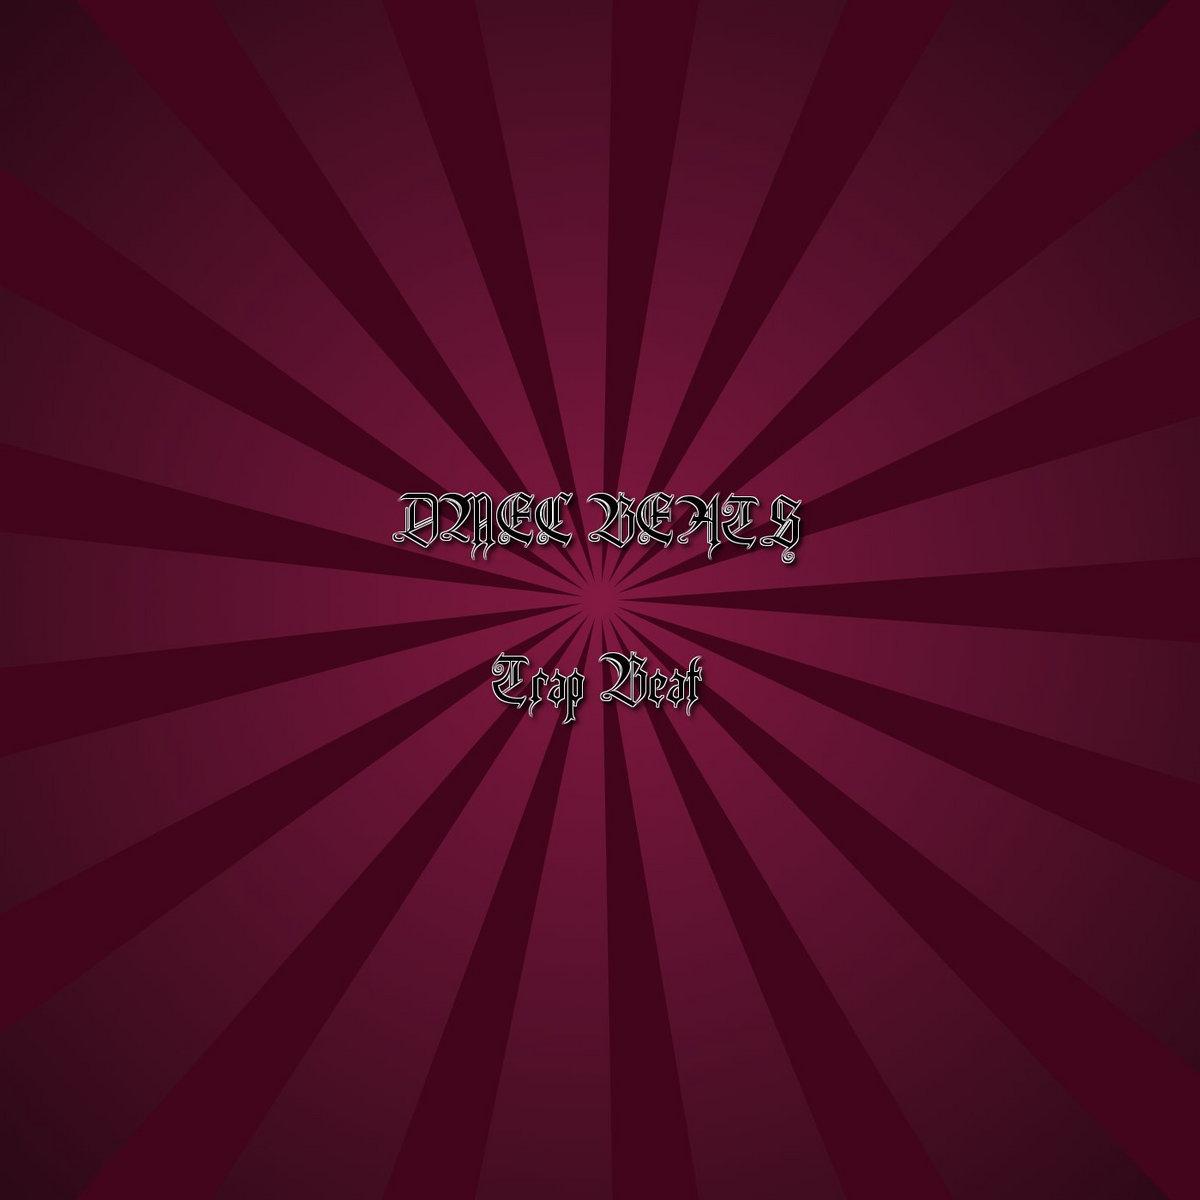 Trap Beat (110 BPM) | DMEC BEATS